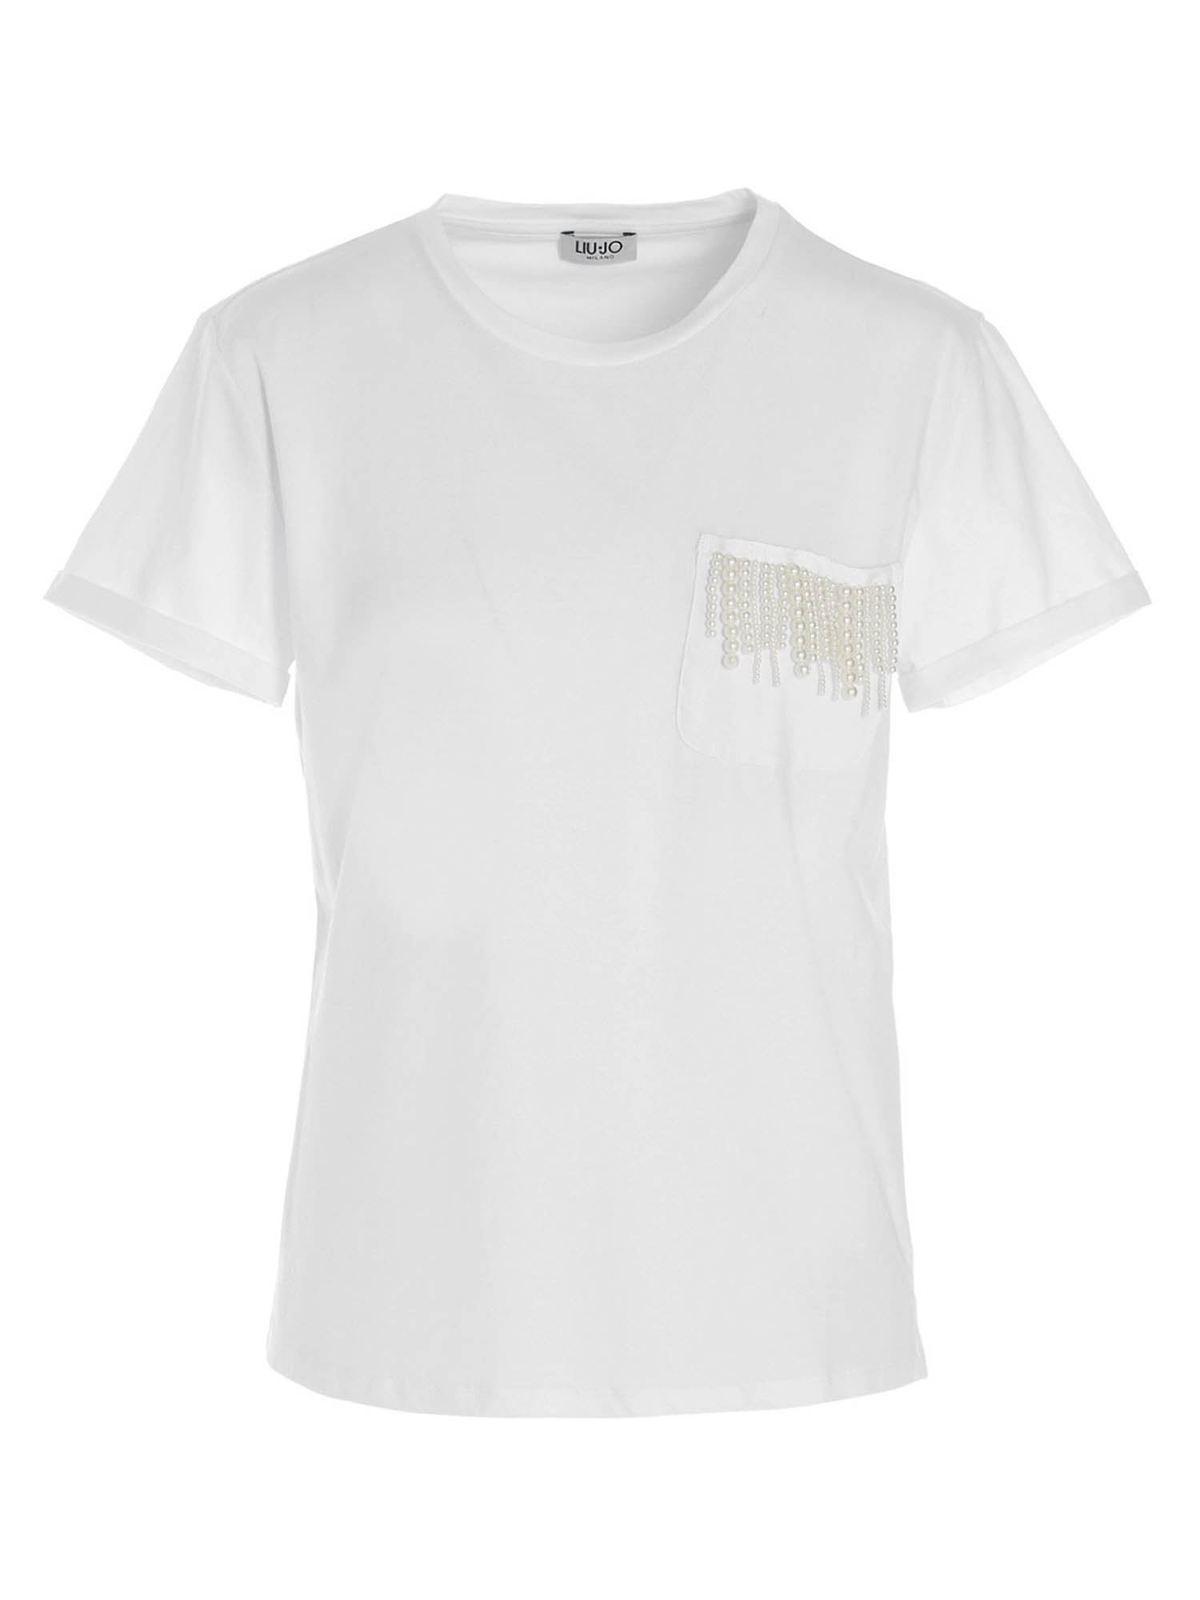 Liu •jo PEARL POCKET T-SHIRT IN WHITE